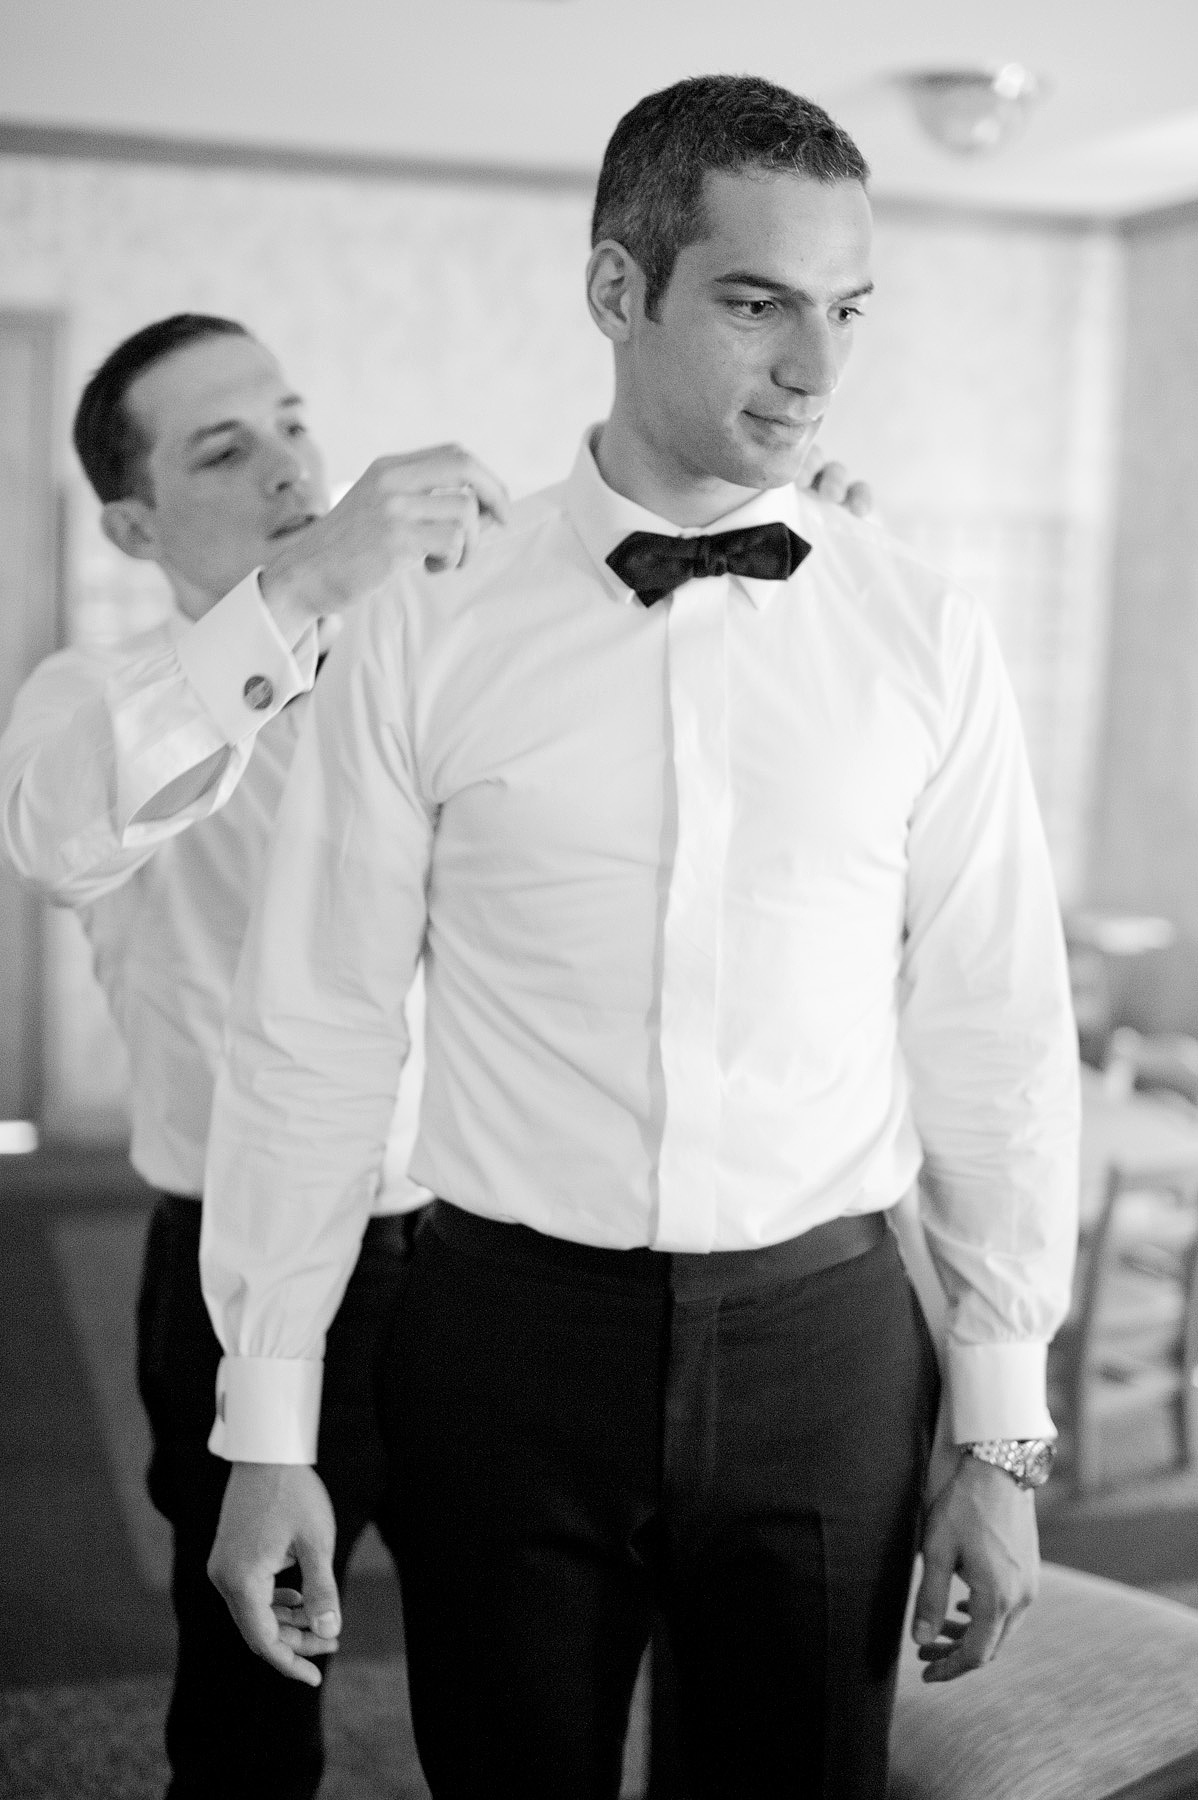 minneapolis-wedding-photography-mark-kegans-339.jpg